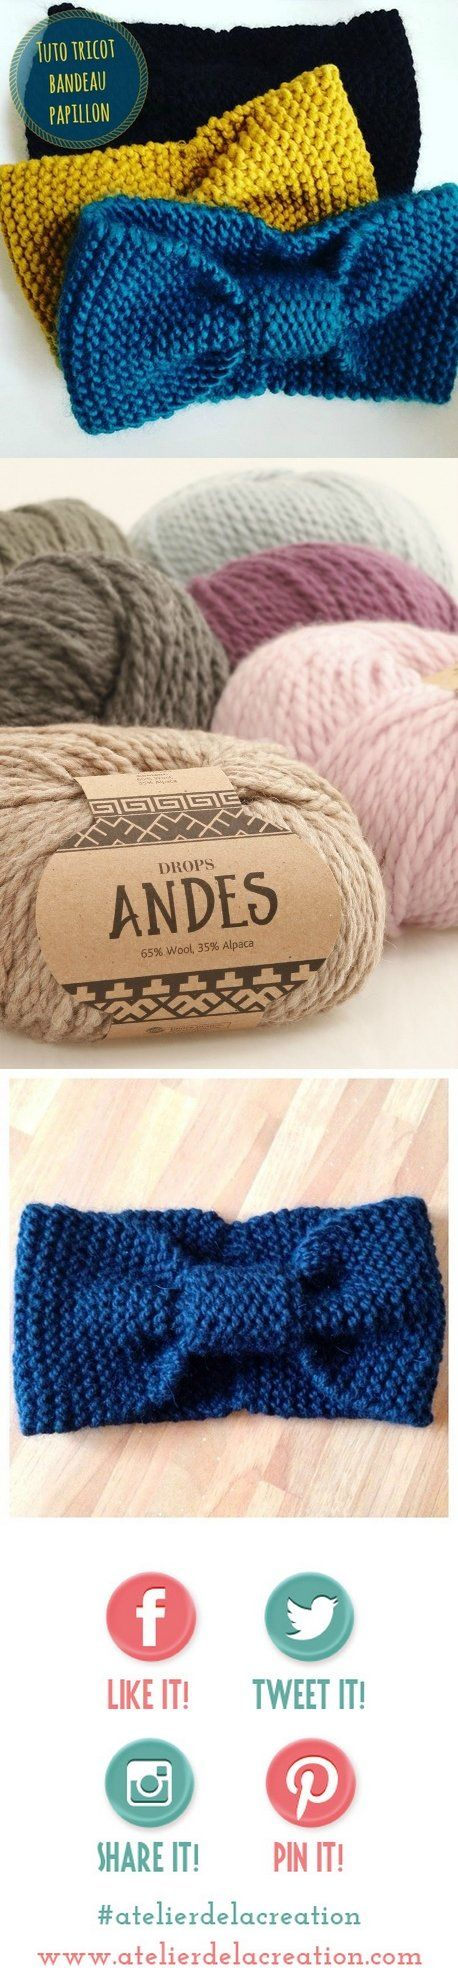 tuto tricot bandeau papillon en drops andes fil laine tissu. Black Bedroom Furniture Sets. Home Design Ideas